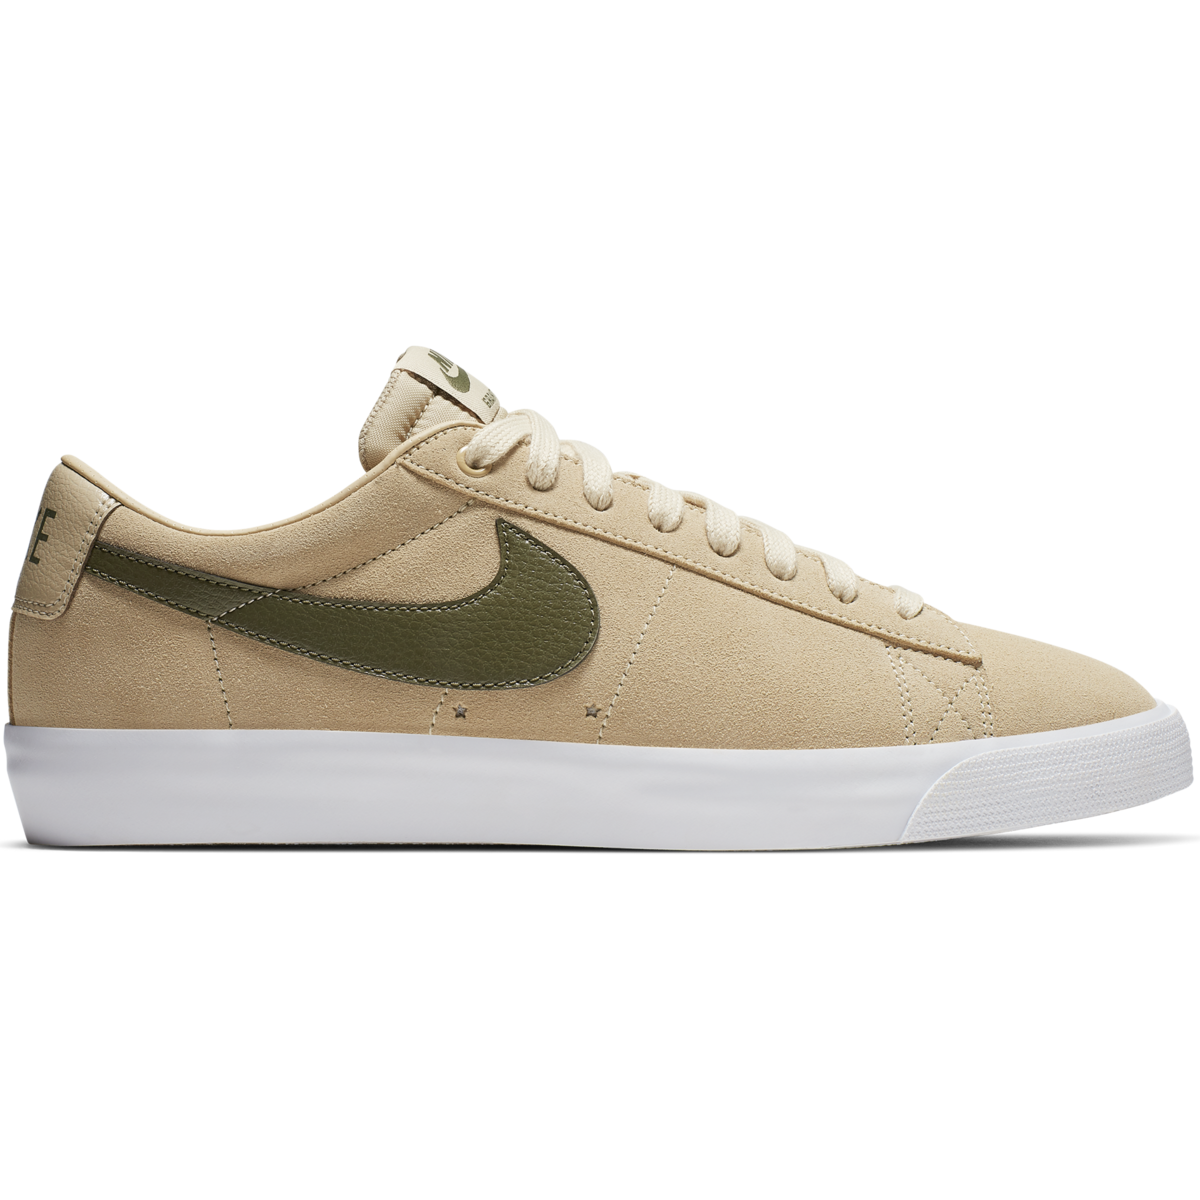 online retailer f9ea0 1b49a Nike SB Blazer Low GT - Desert Ore/Medium Olive